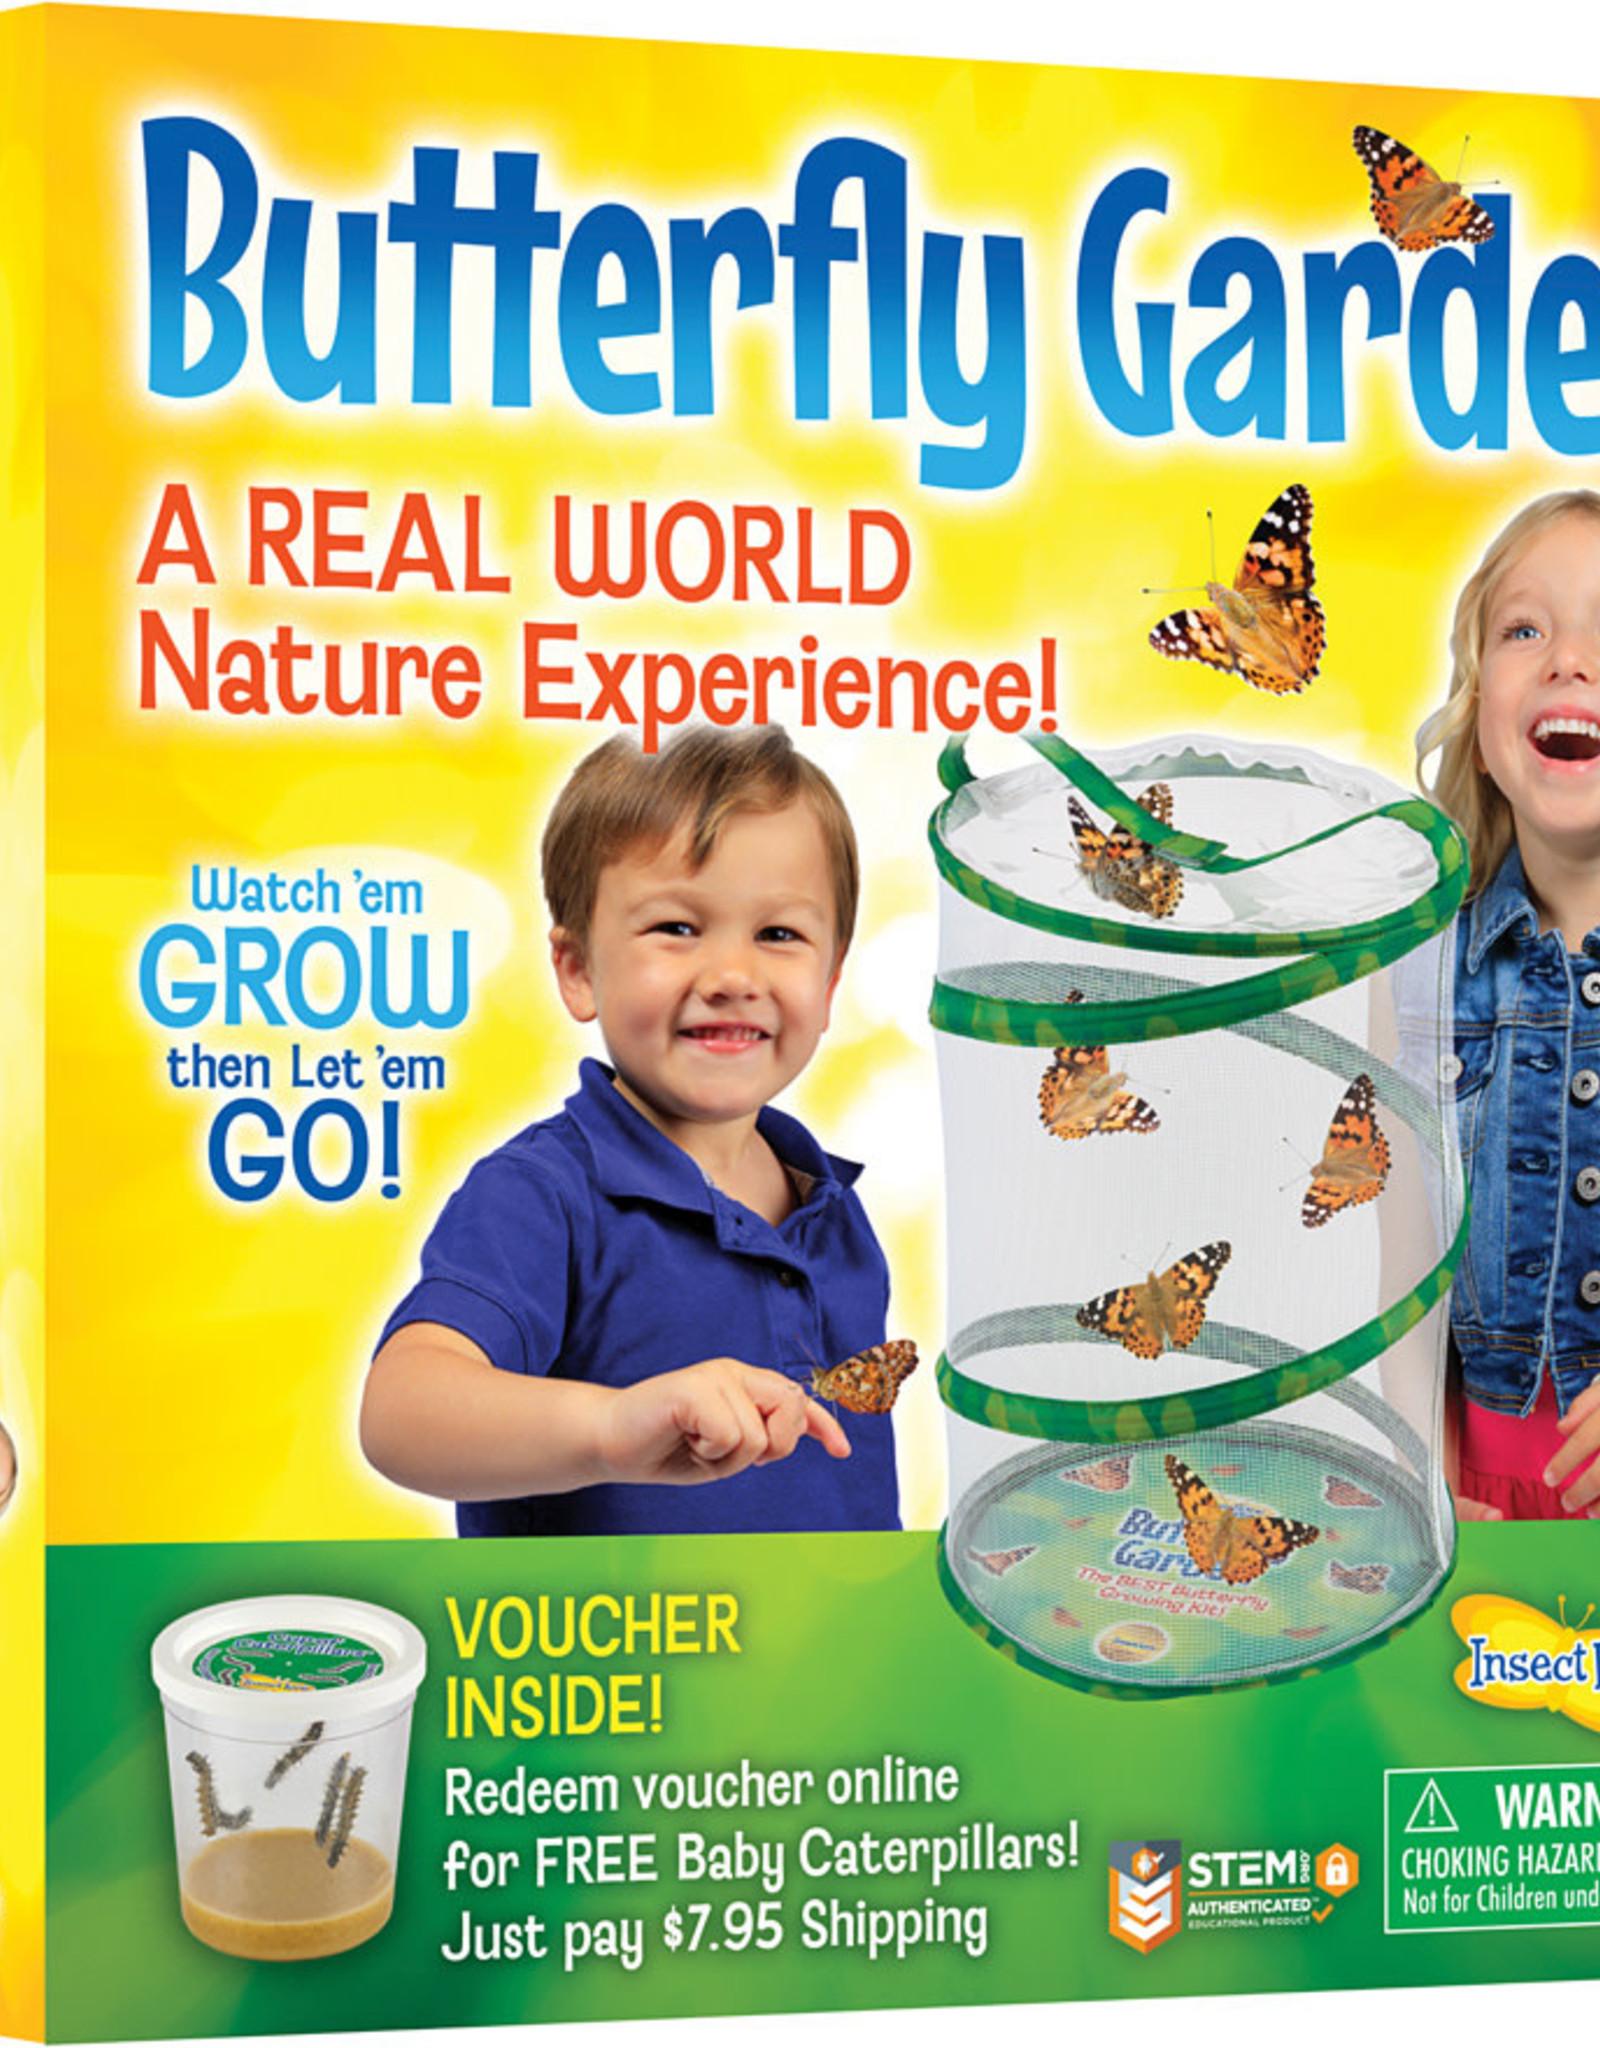 Butterfly Garden * With Voucher